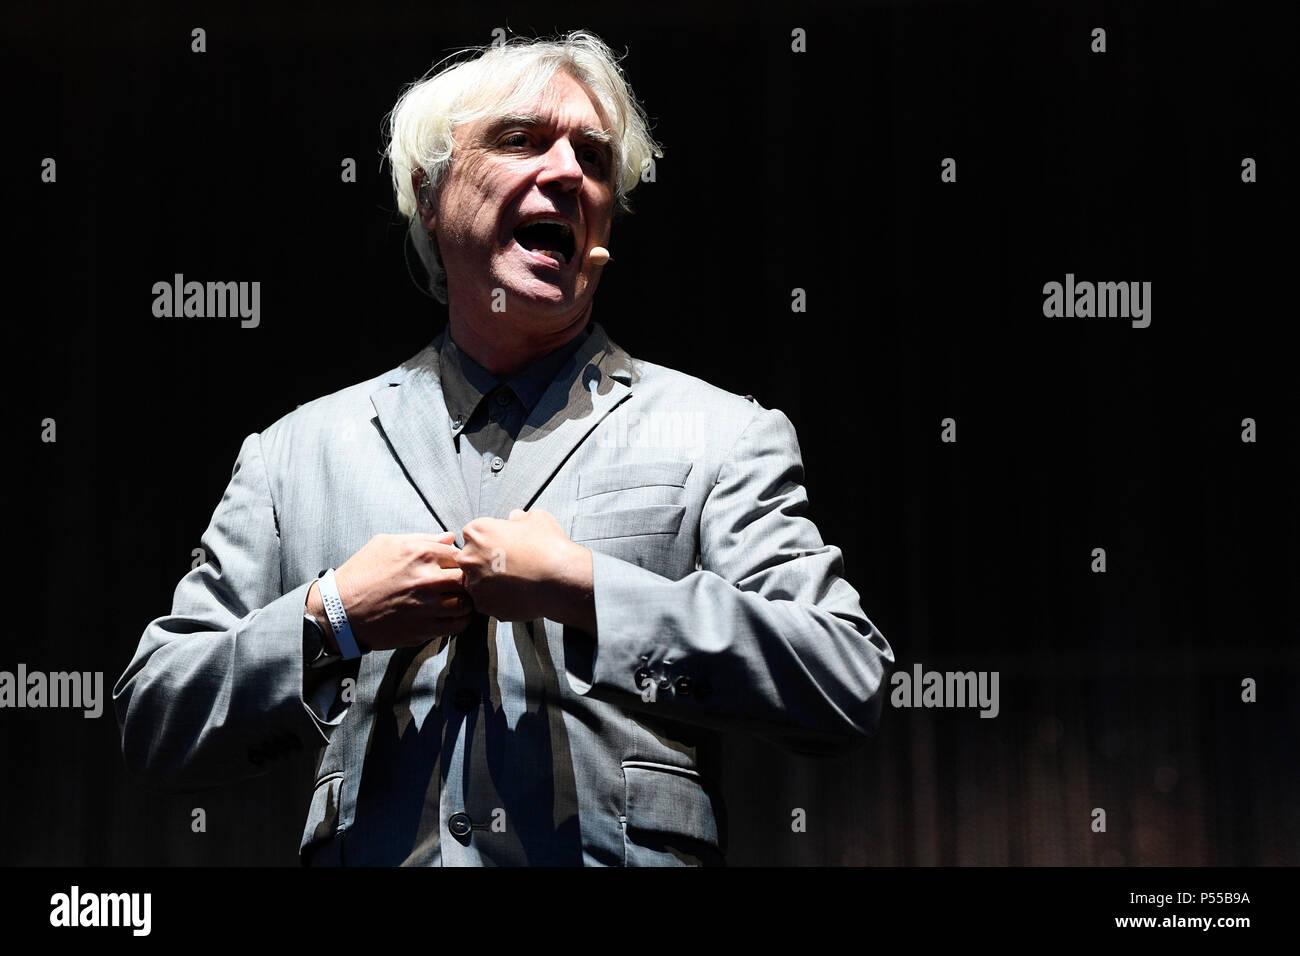 Prague, Czech Republic. 23rd June, 2018. British (Scottish) musician David Byrne performs during the Metronome music festival in Prague, Czech Republic, on June 23, 2018. Credit: Ondrej Deml/CTK Photo/Alamy Live News - Stock Image